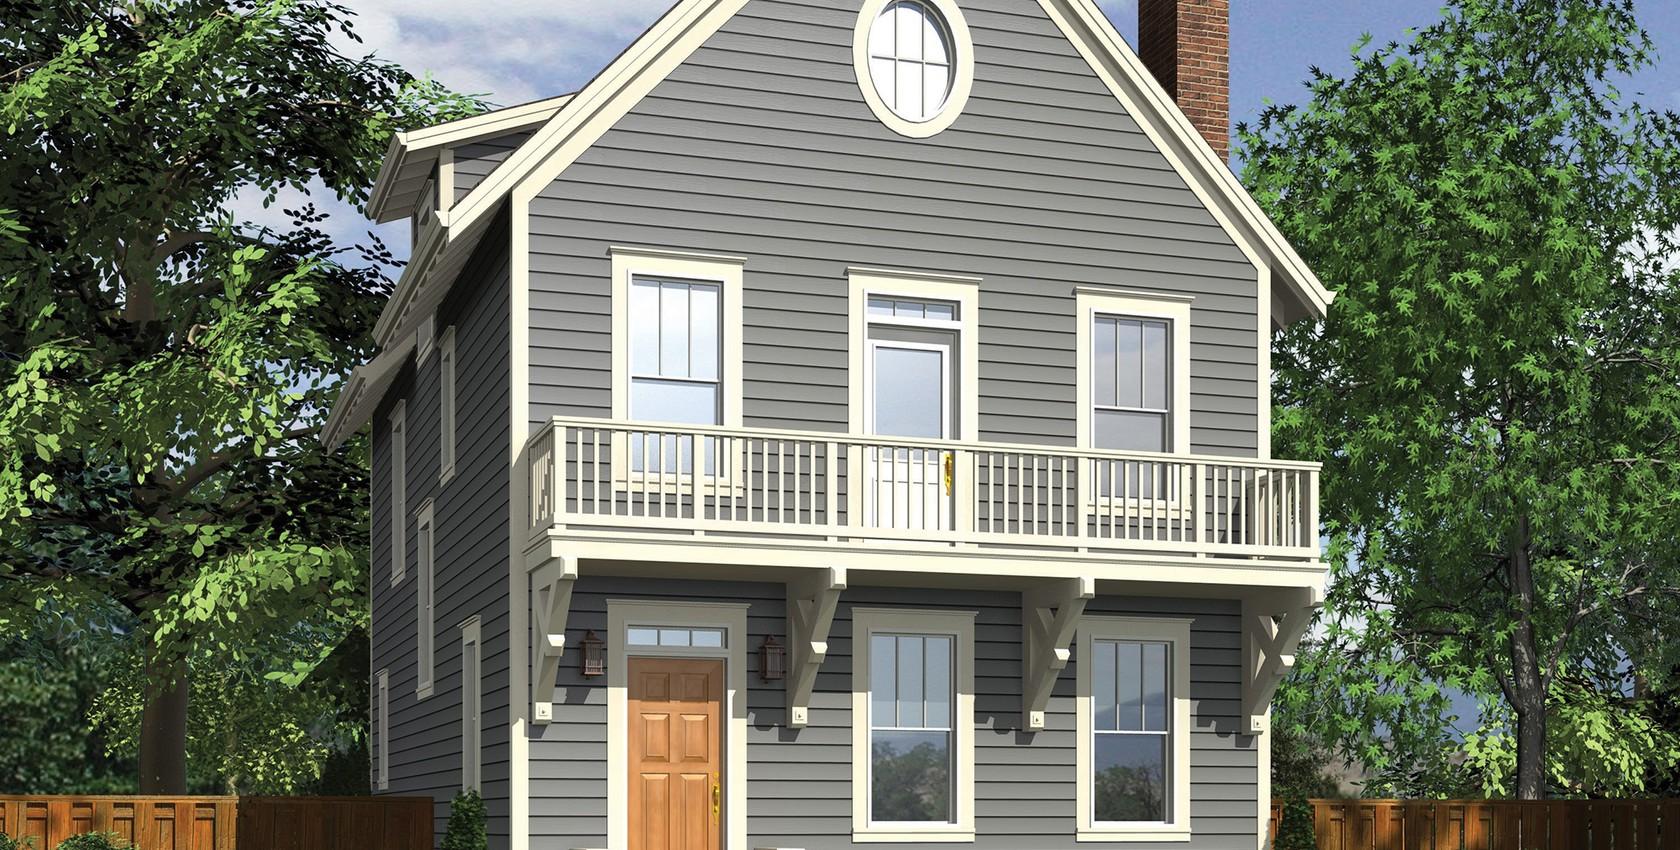 Mascord house plan 22171a the eaton for Houseplans co